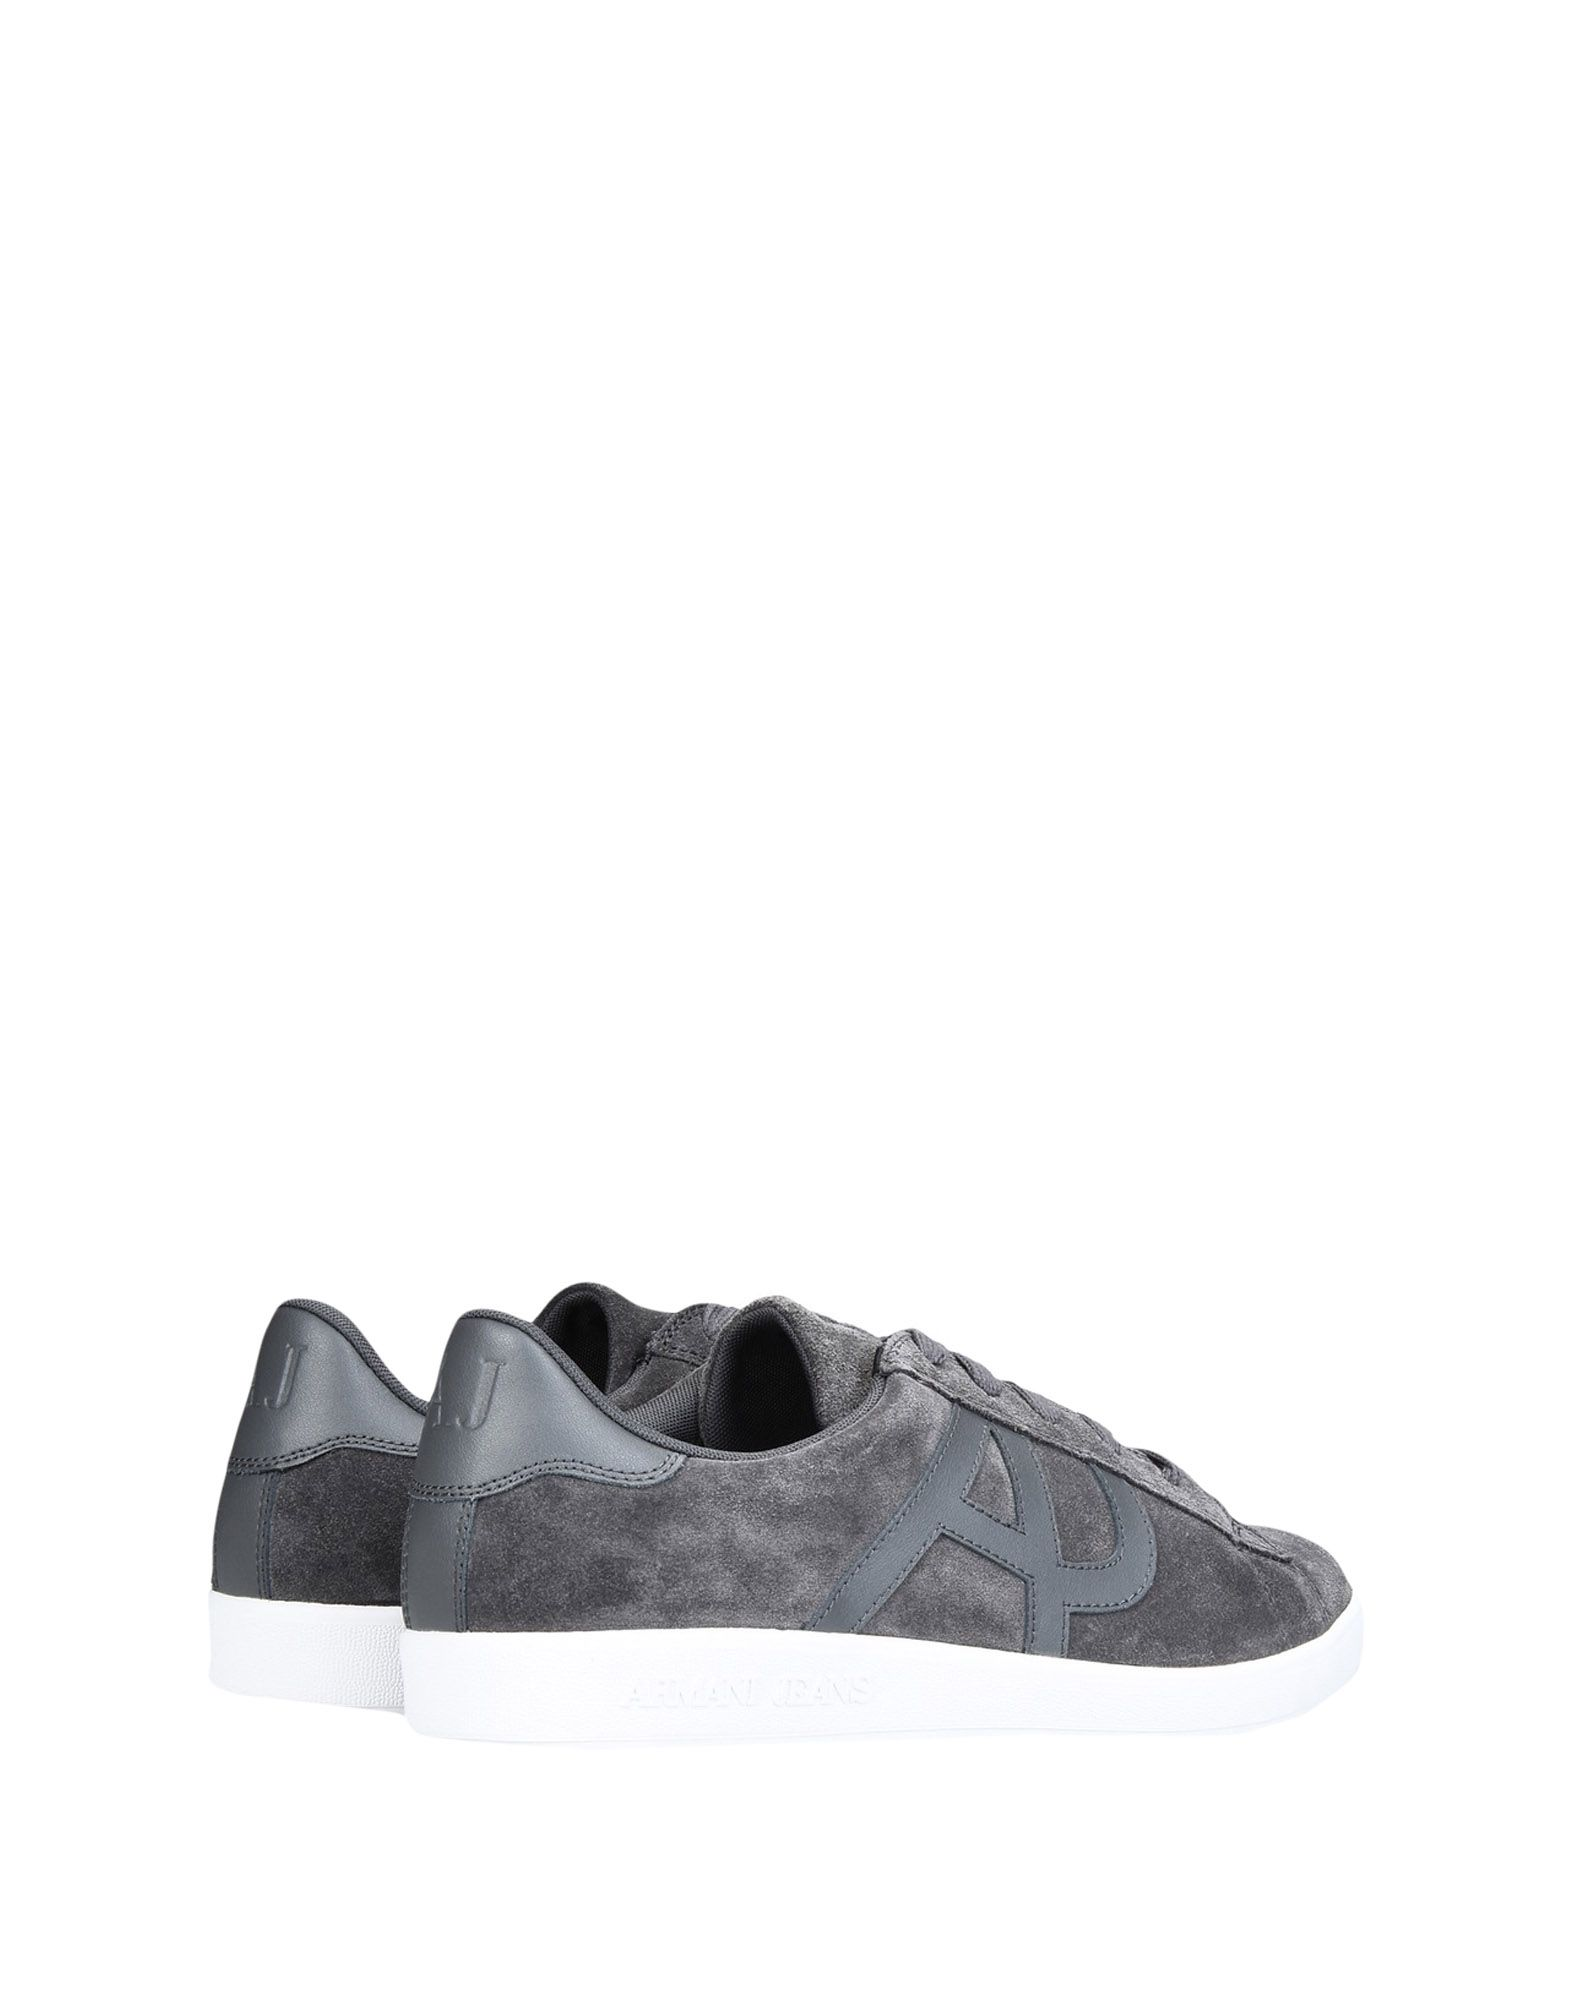 Armani Jeans Sneakers 11270488PG Herren  11270488PG Sneakers Neue Schuhe 235a68